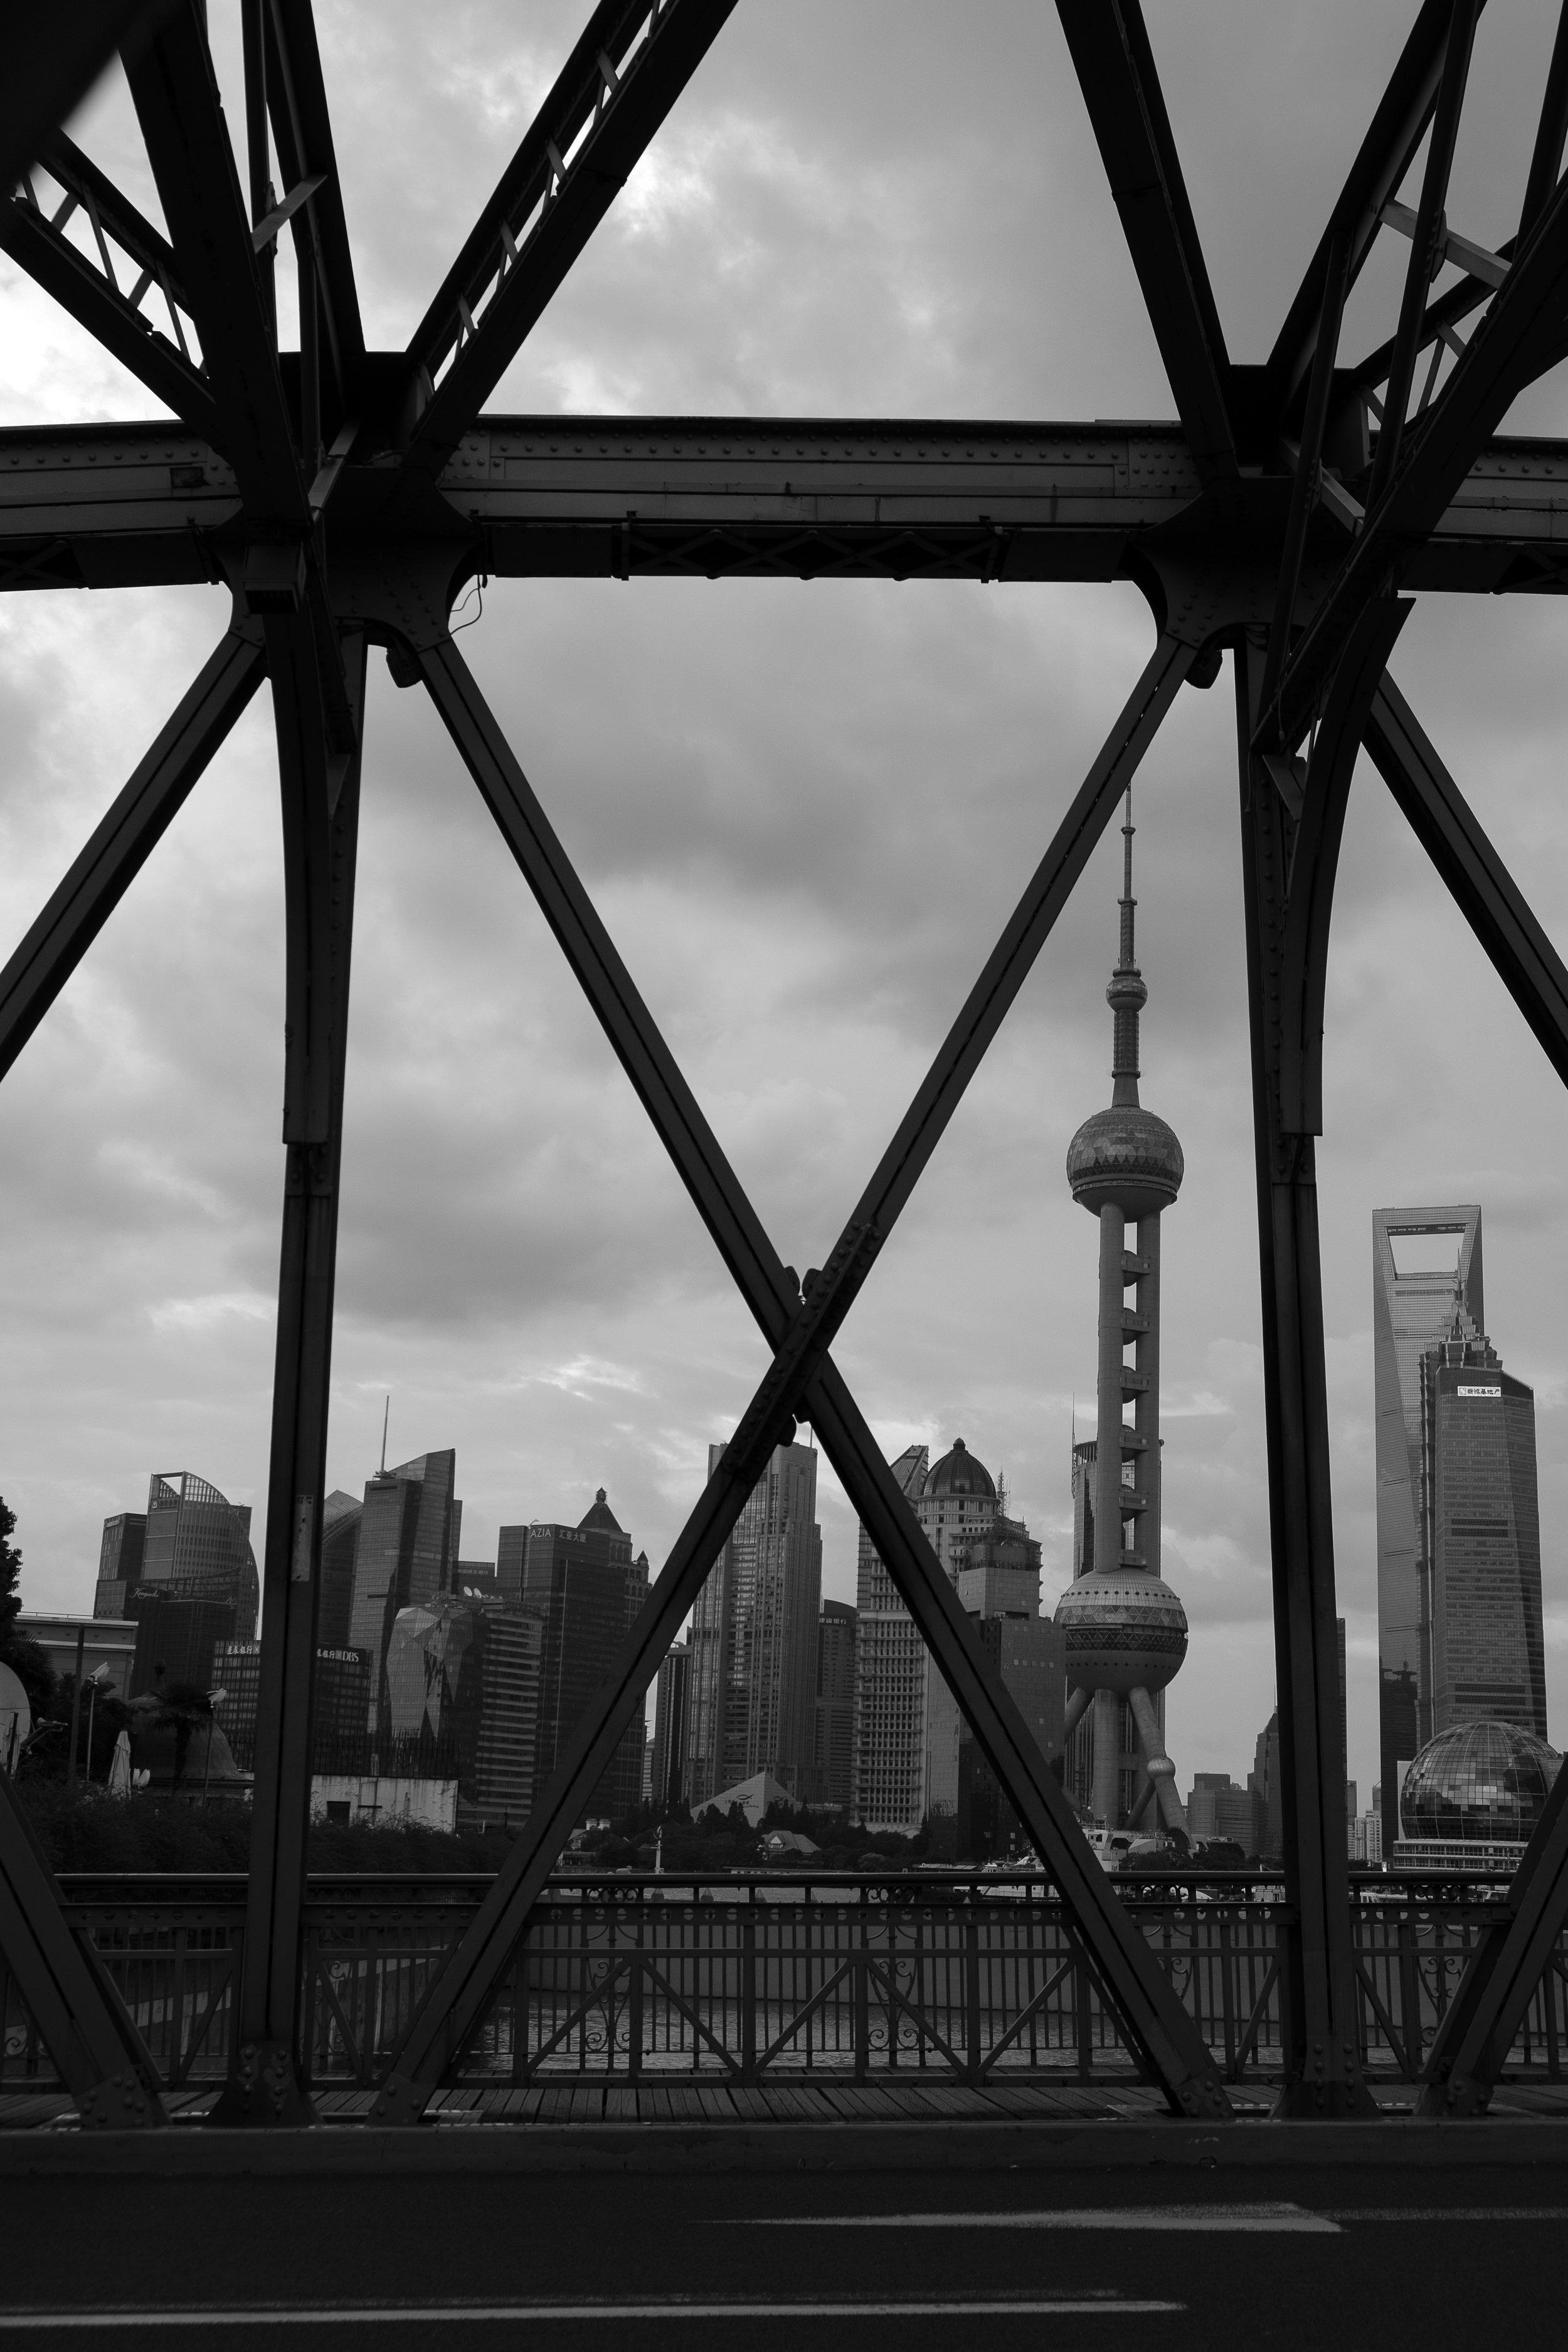 Skyline from Waibaidu Bridge, Shanghai